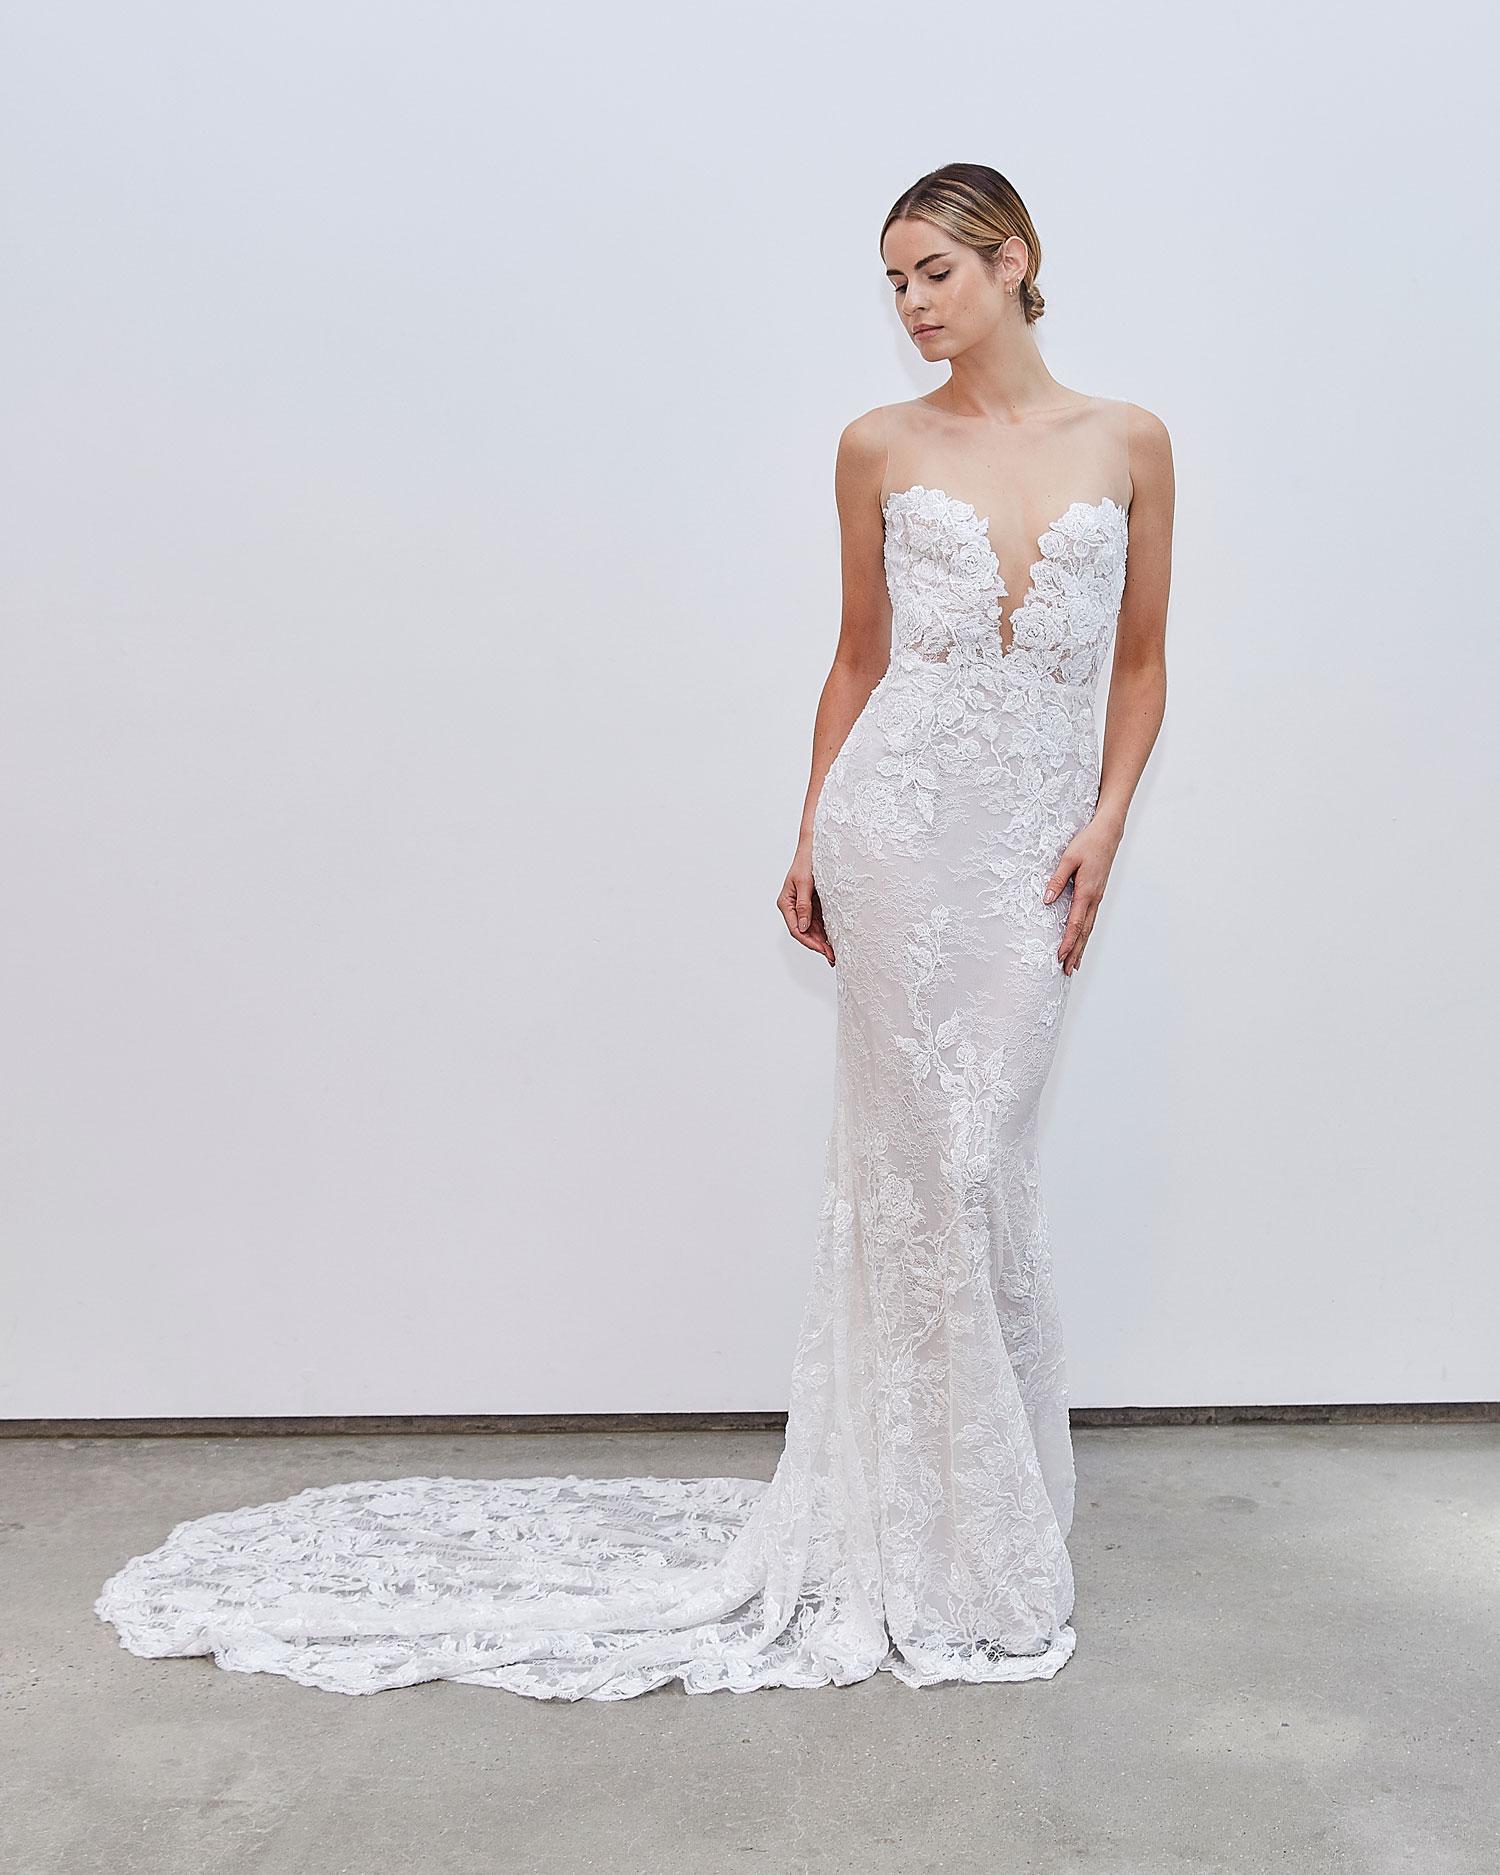 Francesca Miranda Fall 2020 bridal collection Alexis lace wedding dress illusion neckline no sleeves